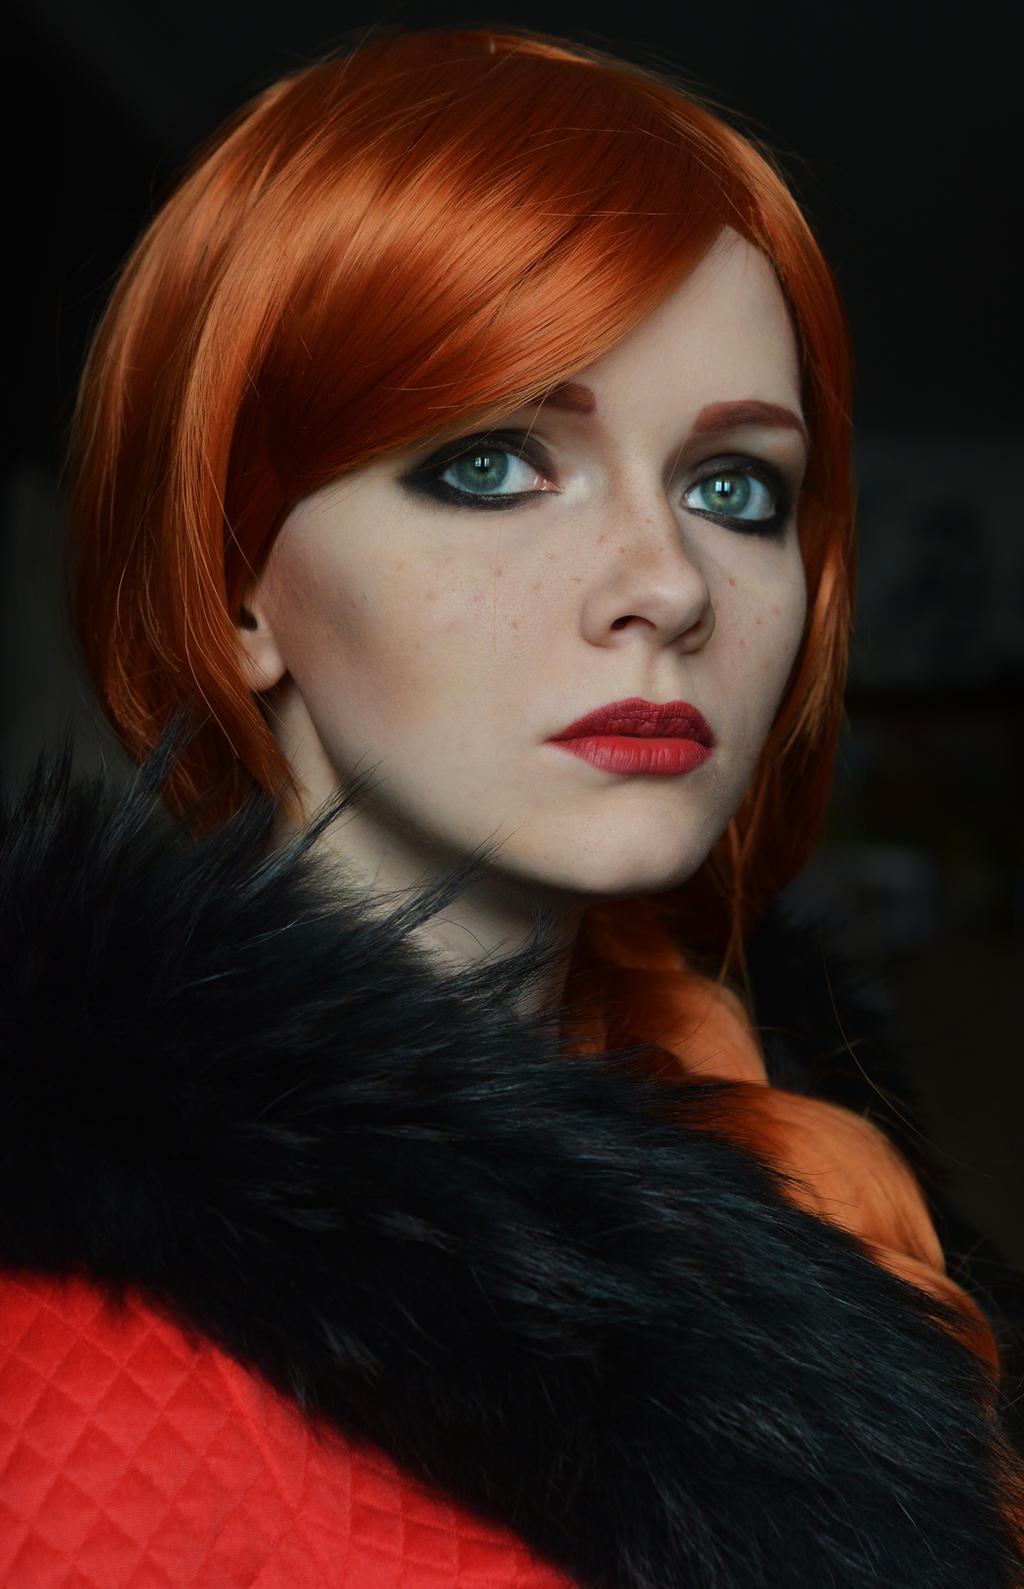 Cerys an Craite - The Witcher 3 by IraNyaaasha